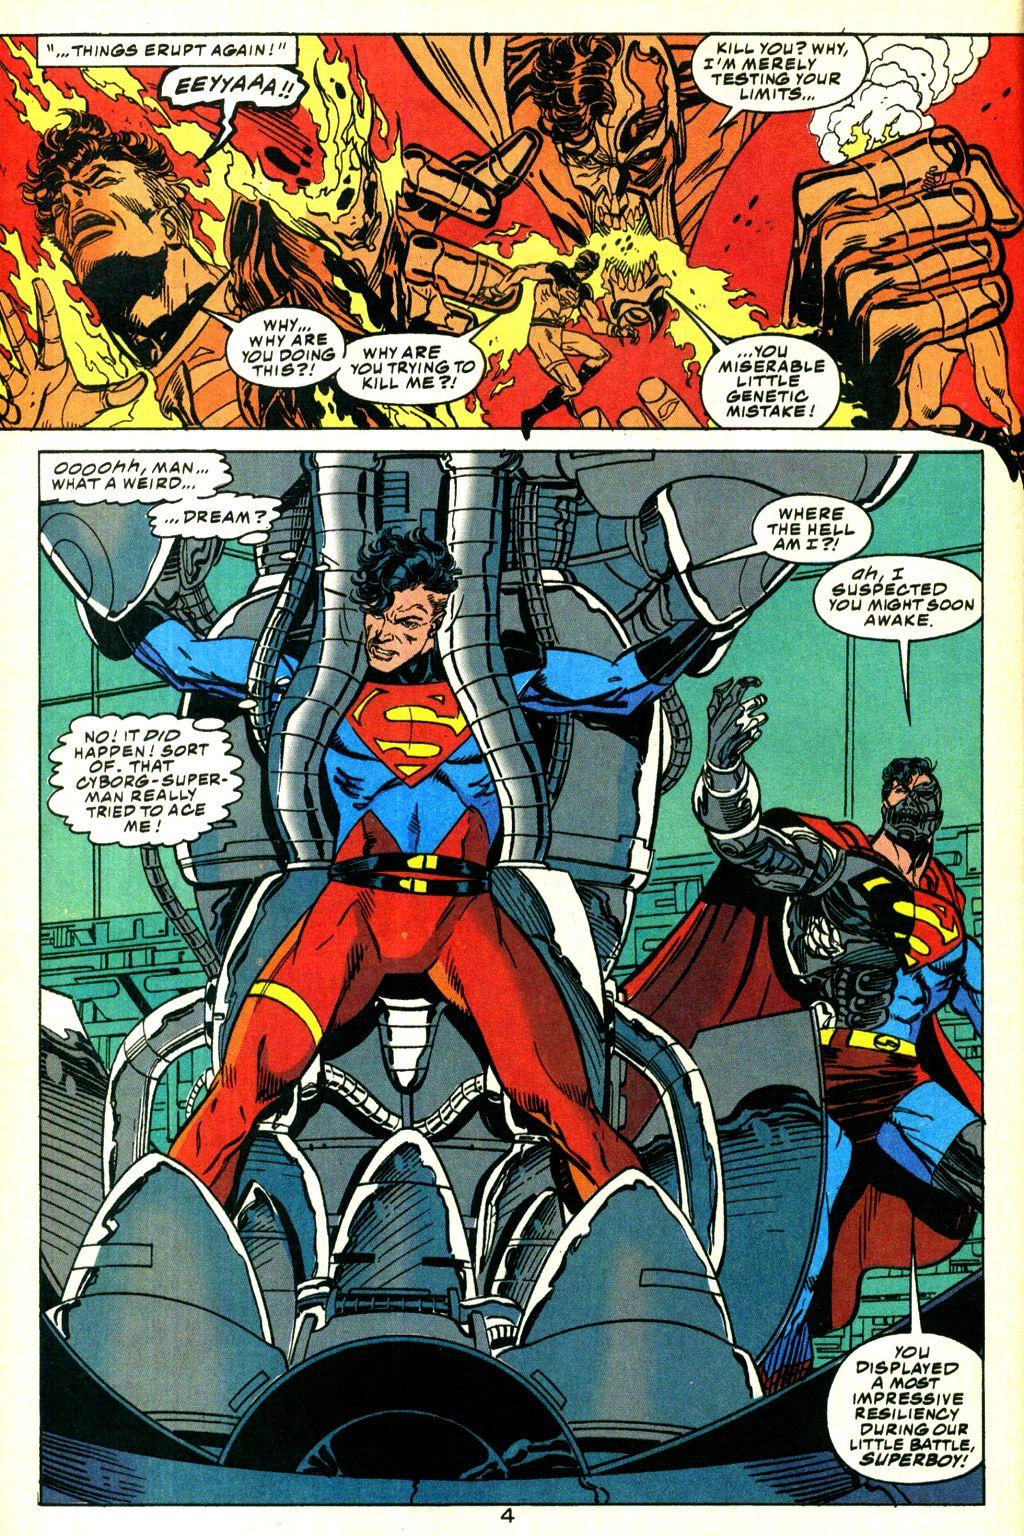 Action Comics (1938) 690 Page 4